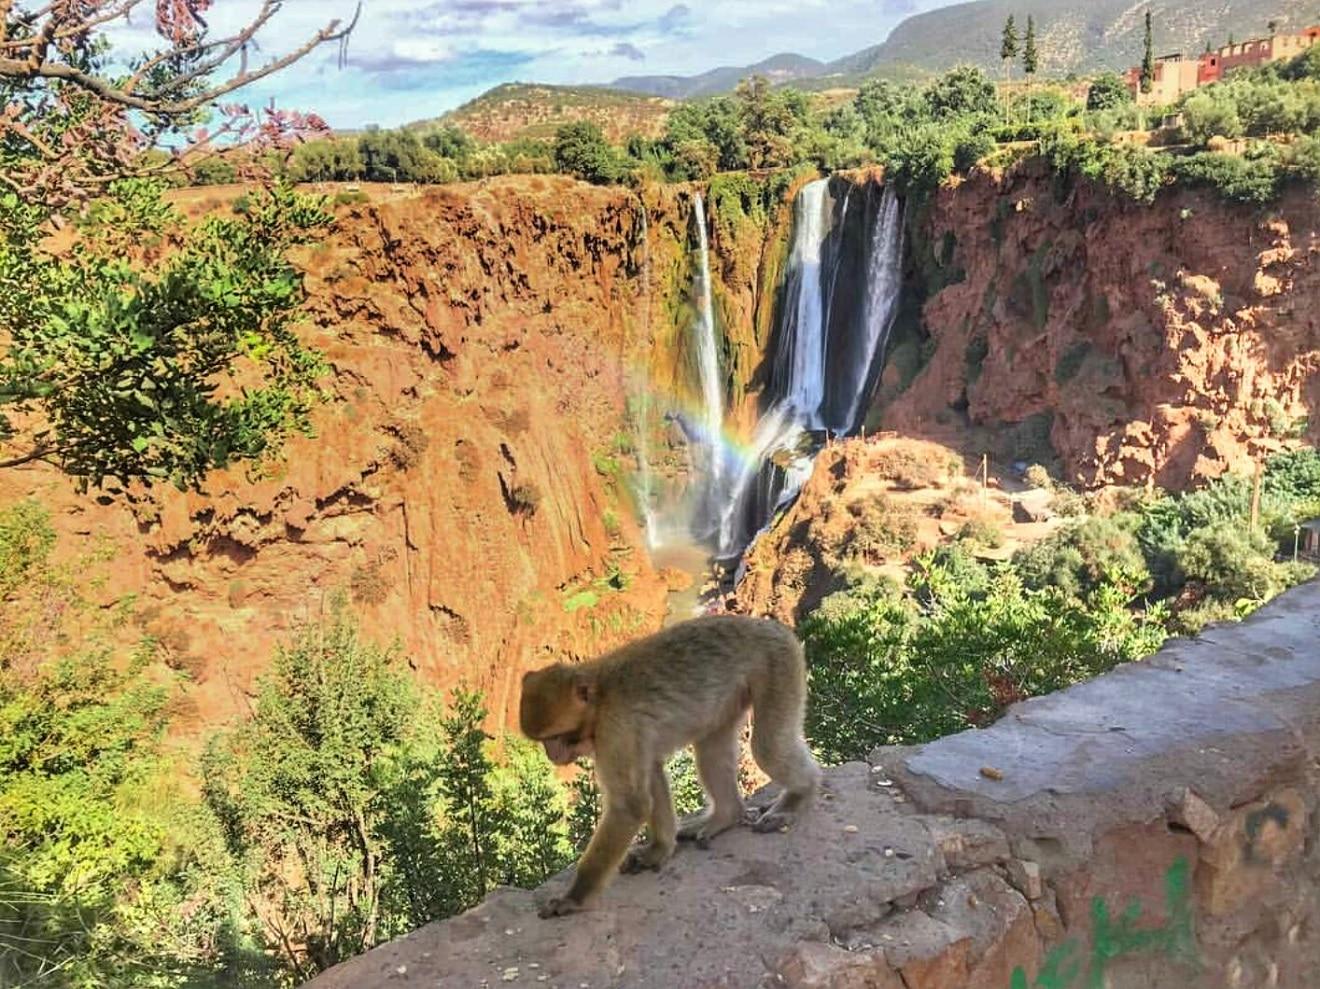 ouzoud monkeys, ouzoud morocco, majmuni na vodopadima, vodopadi ouzoud maroko